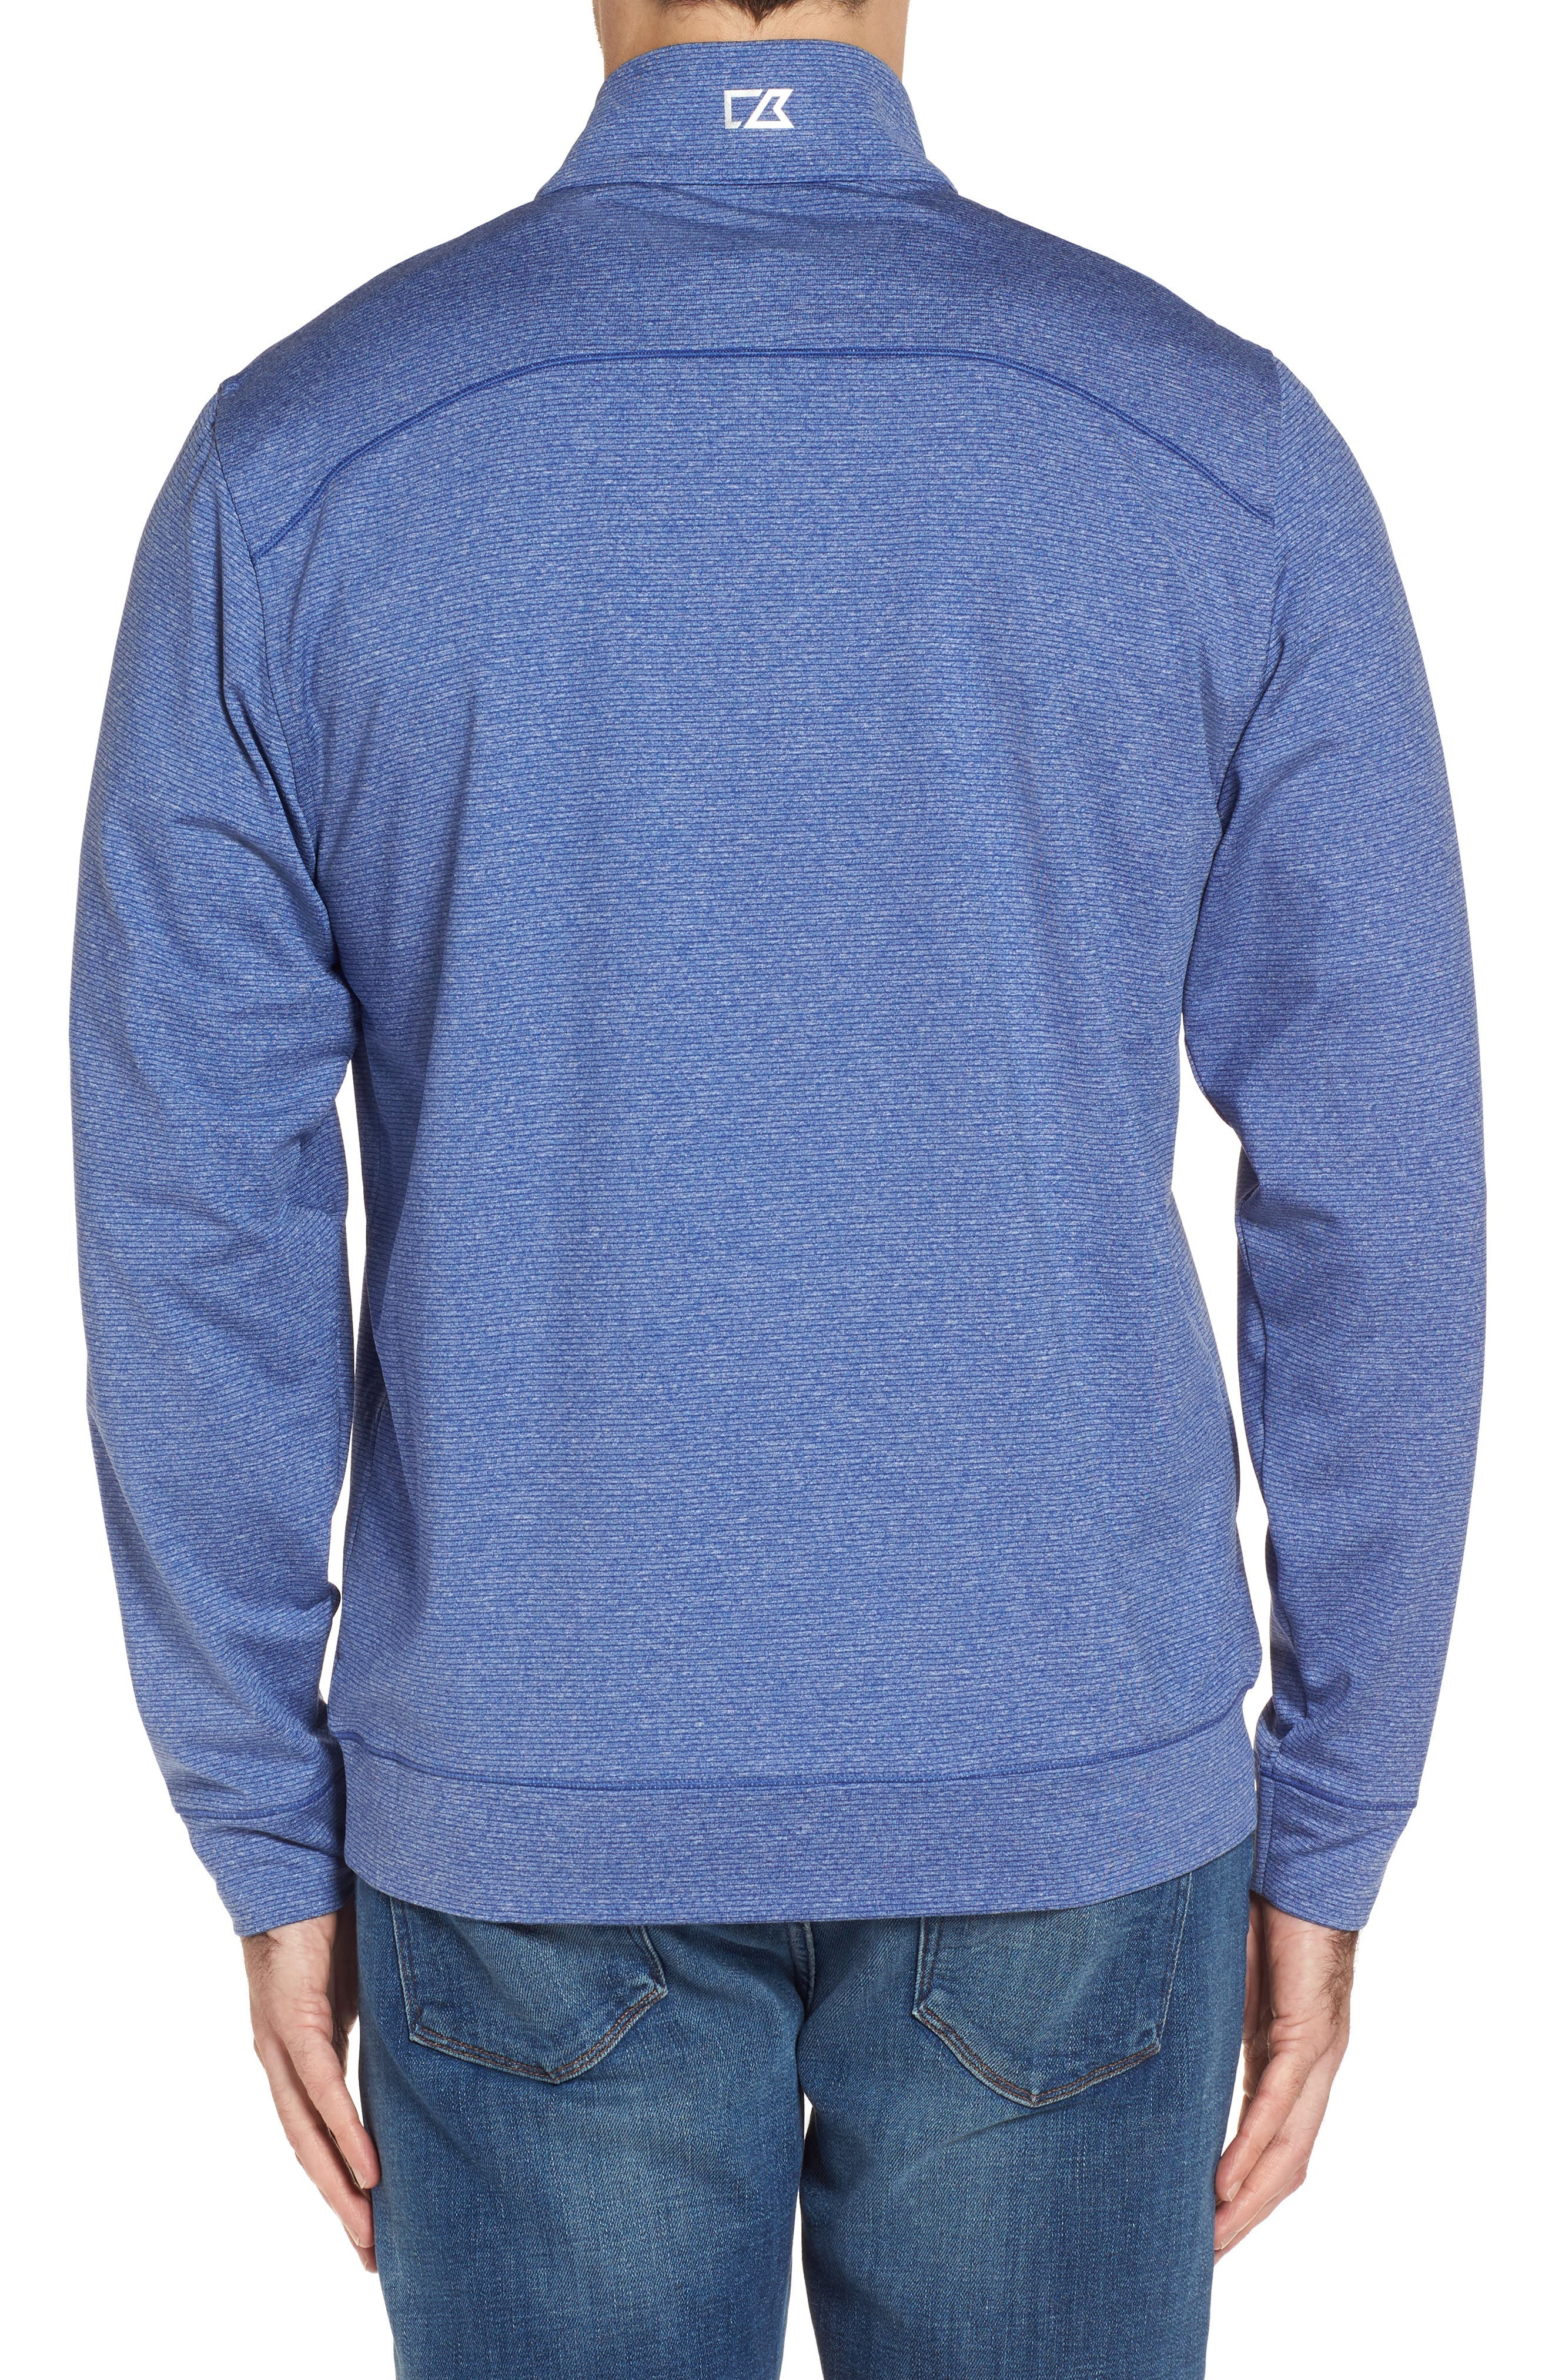 Shoreline - Indianapolis Colts Half Zip Pullover,                             Alternate thumbnail 2, color,                             Tour Blue Heather